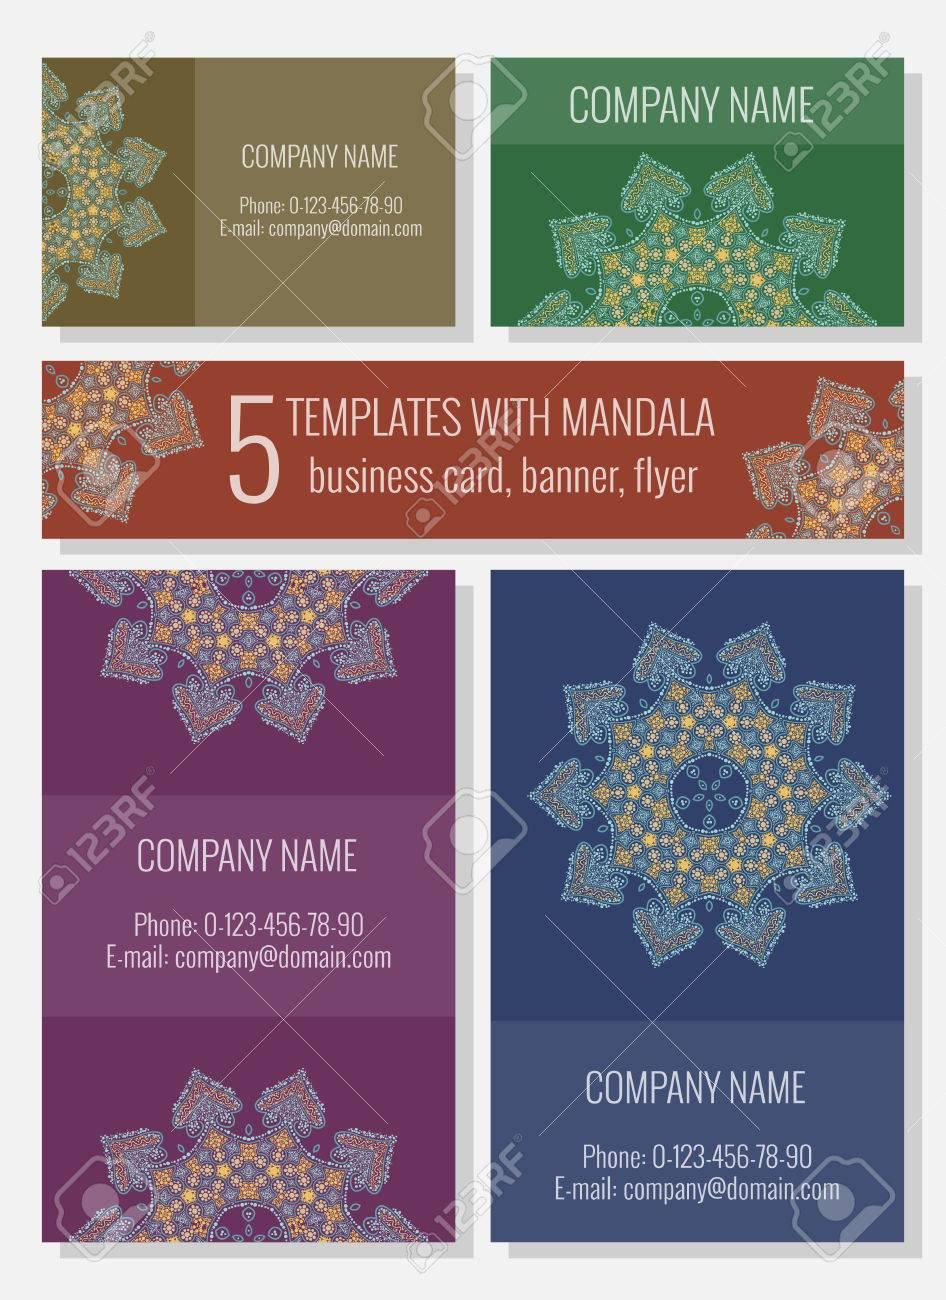 Modeles Avec Mandala Arabesque Carte De Visite Banniere Flyer